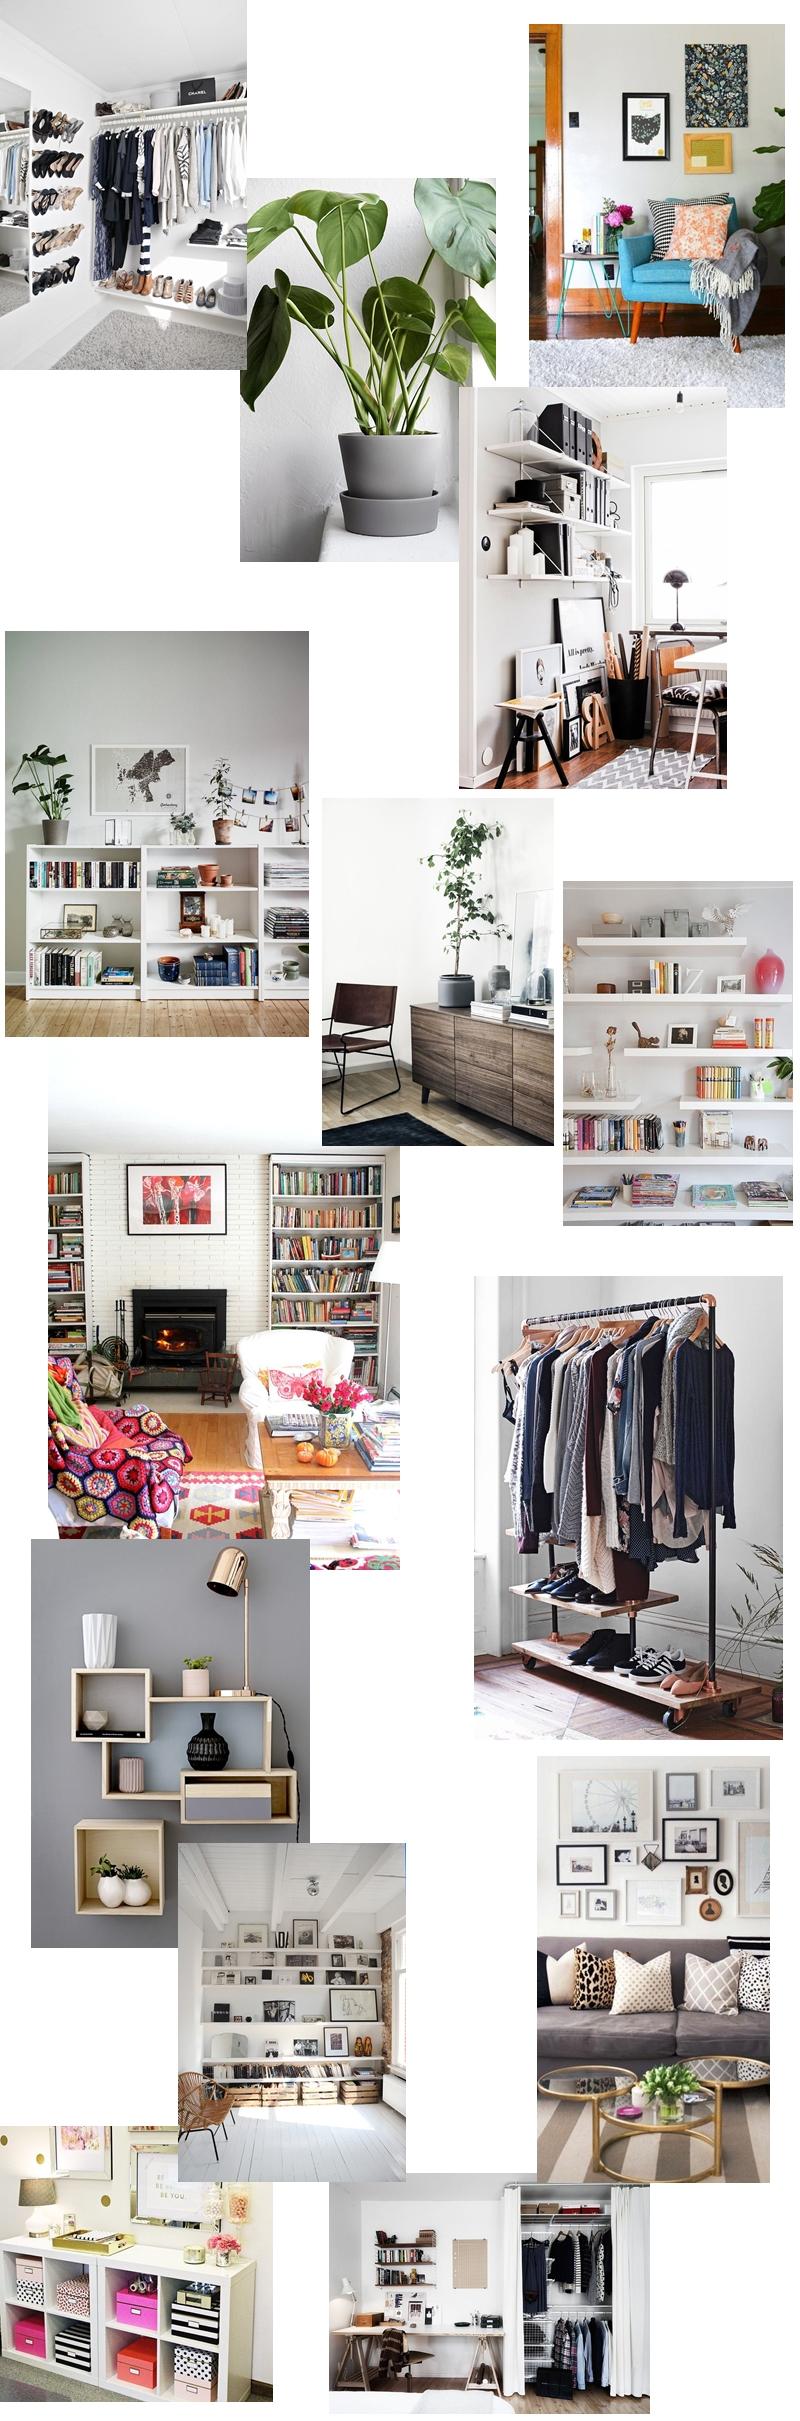 interier-design-inspiration